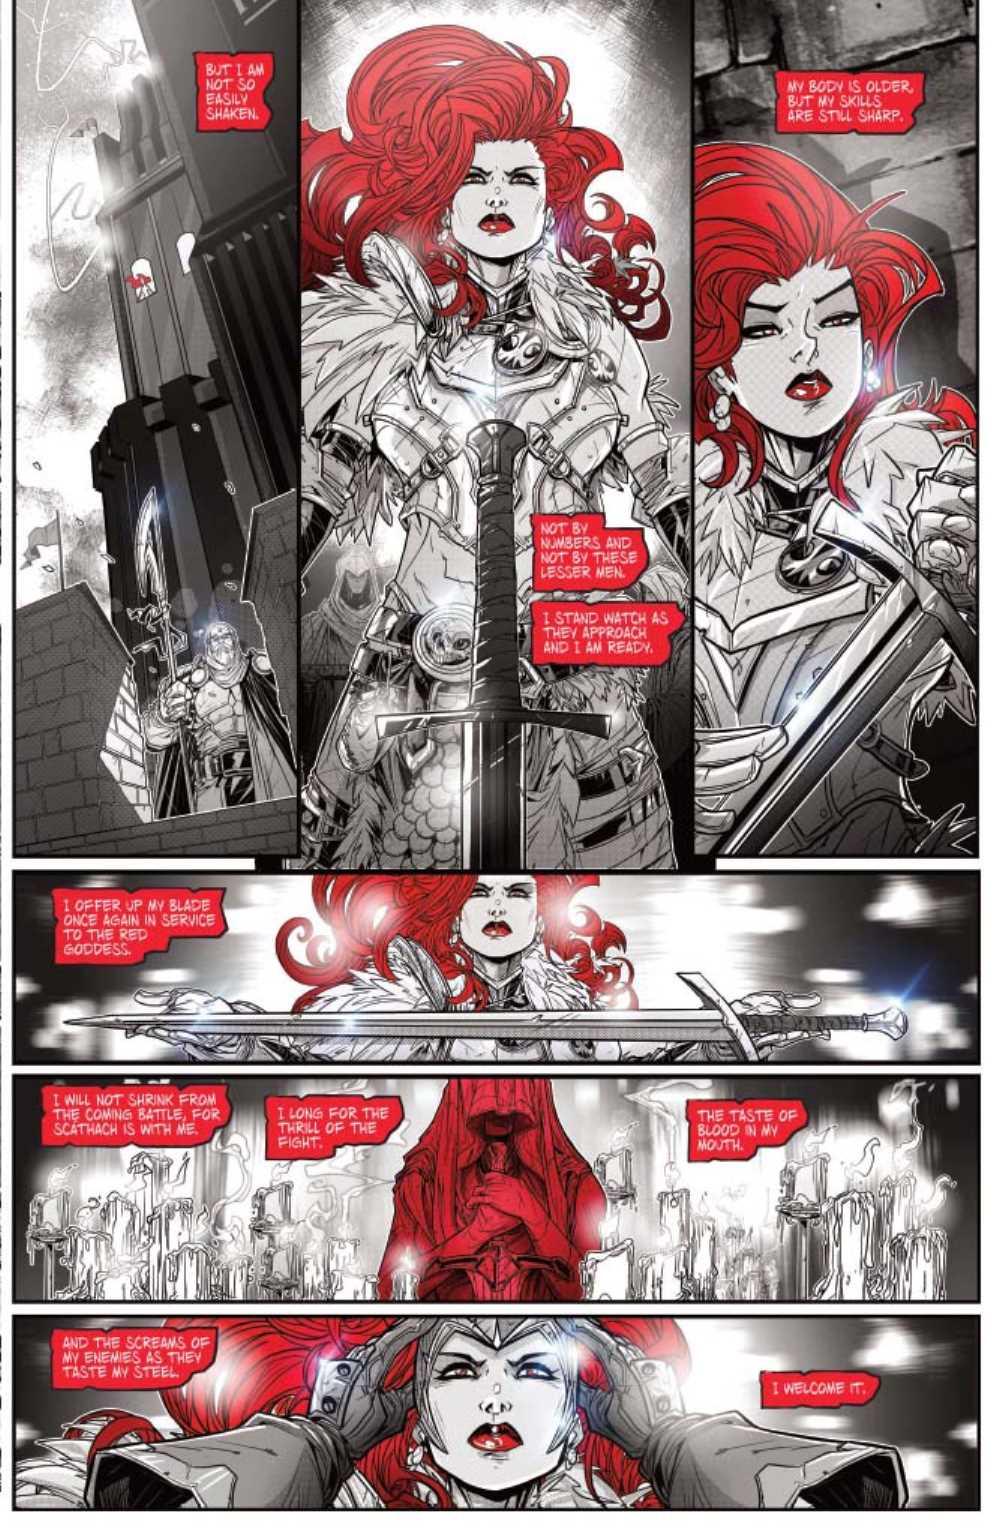 RED SONJA BLACK WHITE RED #23